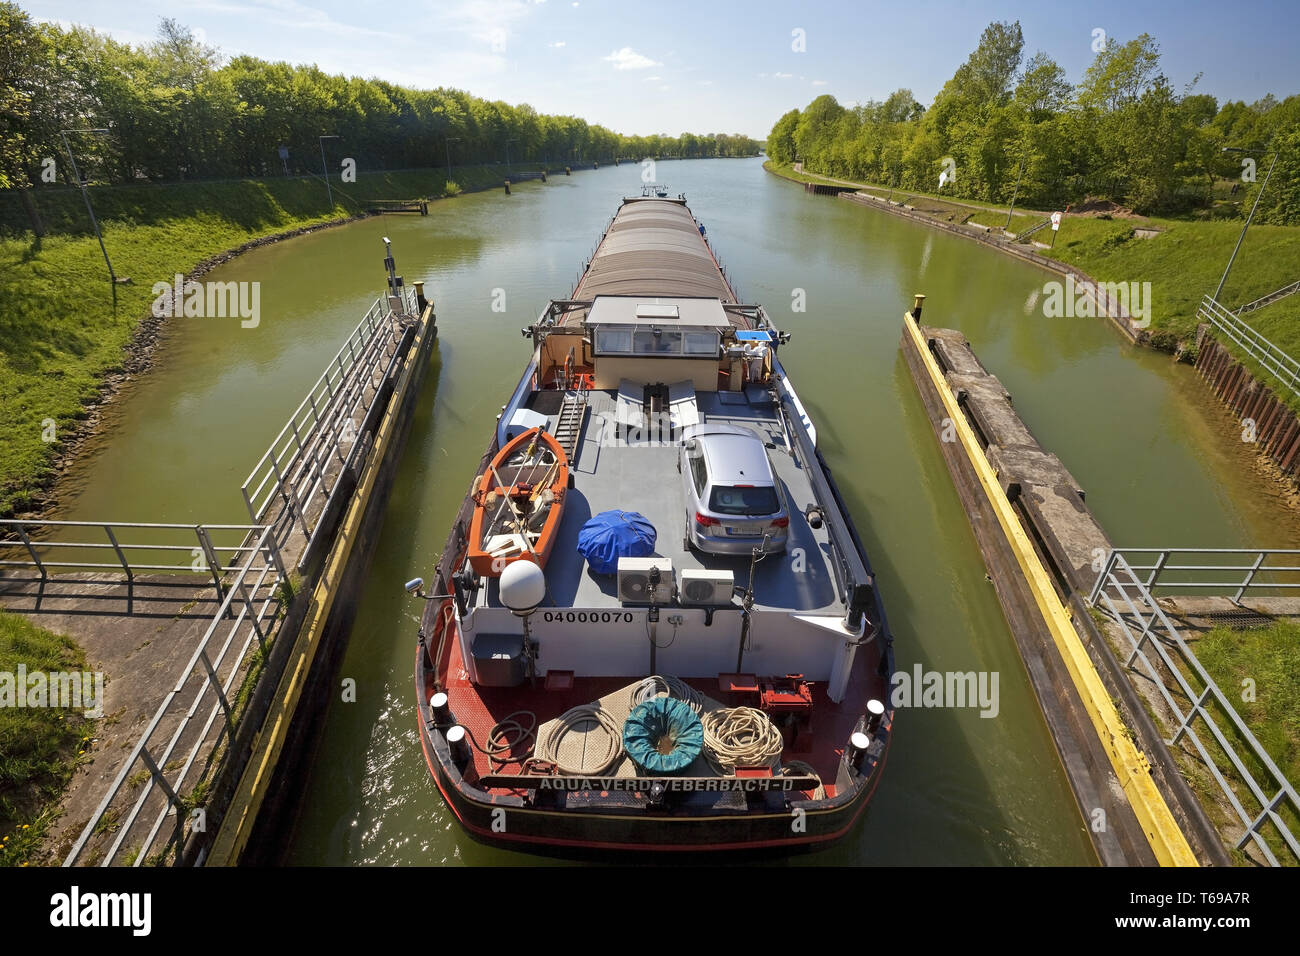 barge leaving the lock Bevergern, Dortmund Ems Canal, Hoerstel, North Rhine-Westphalia, Germany - Stock Image